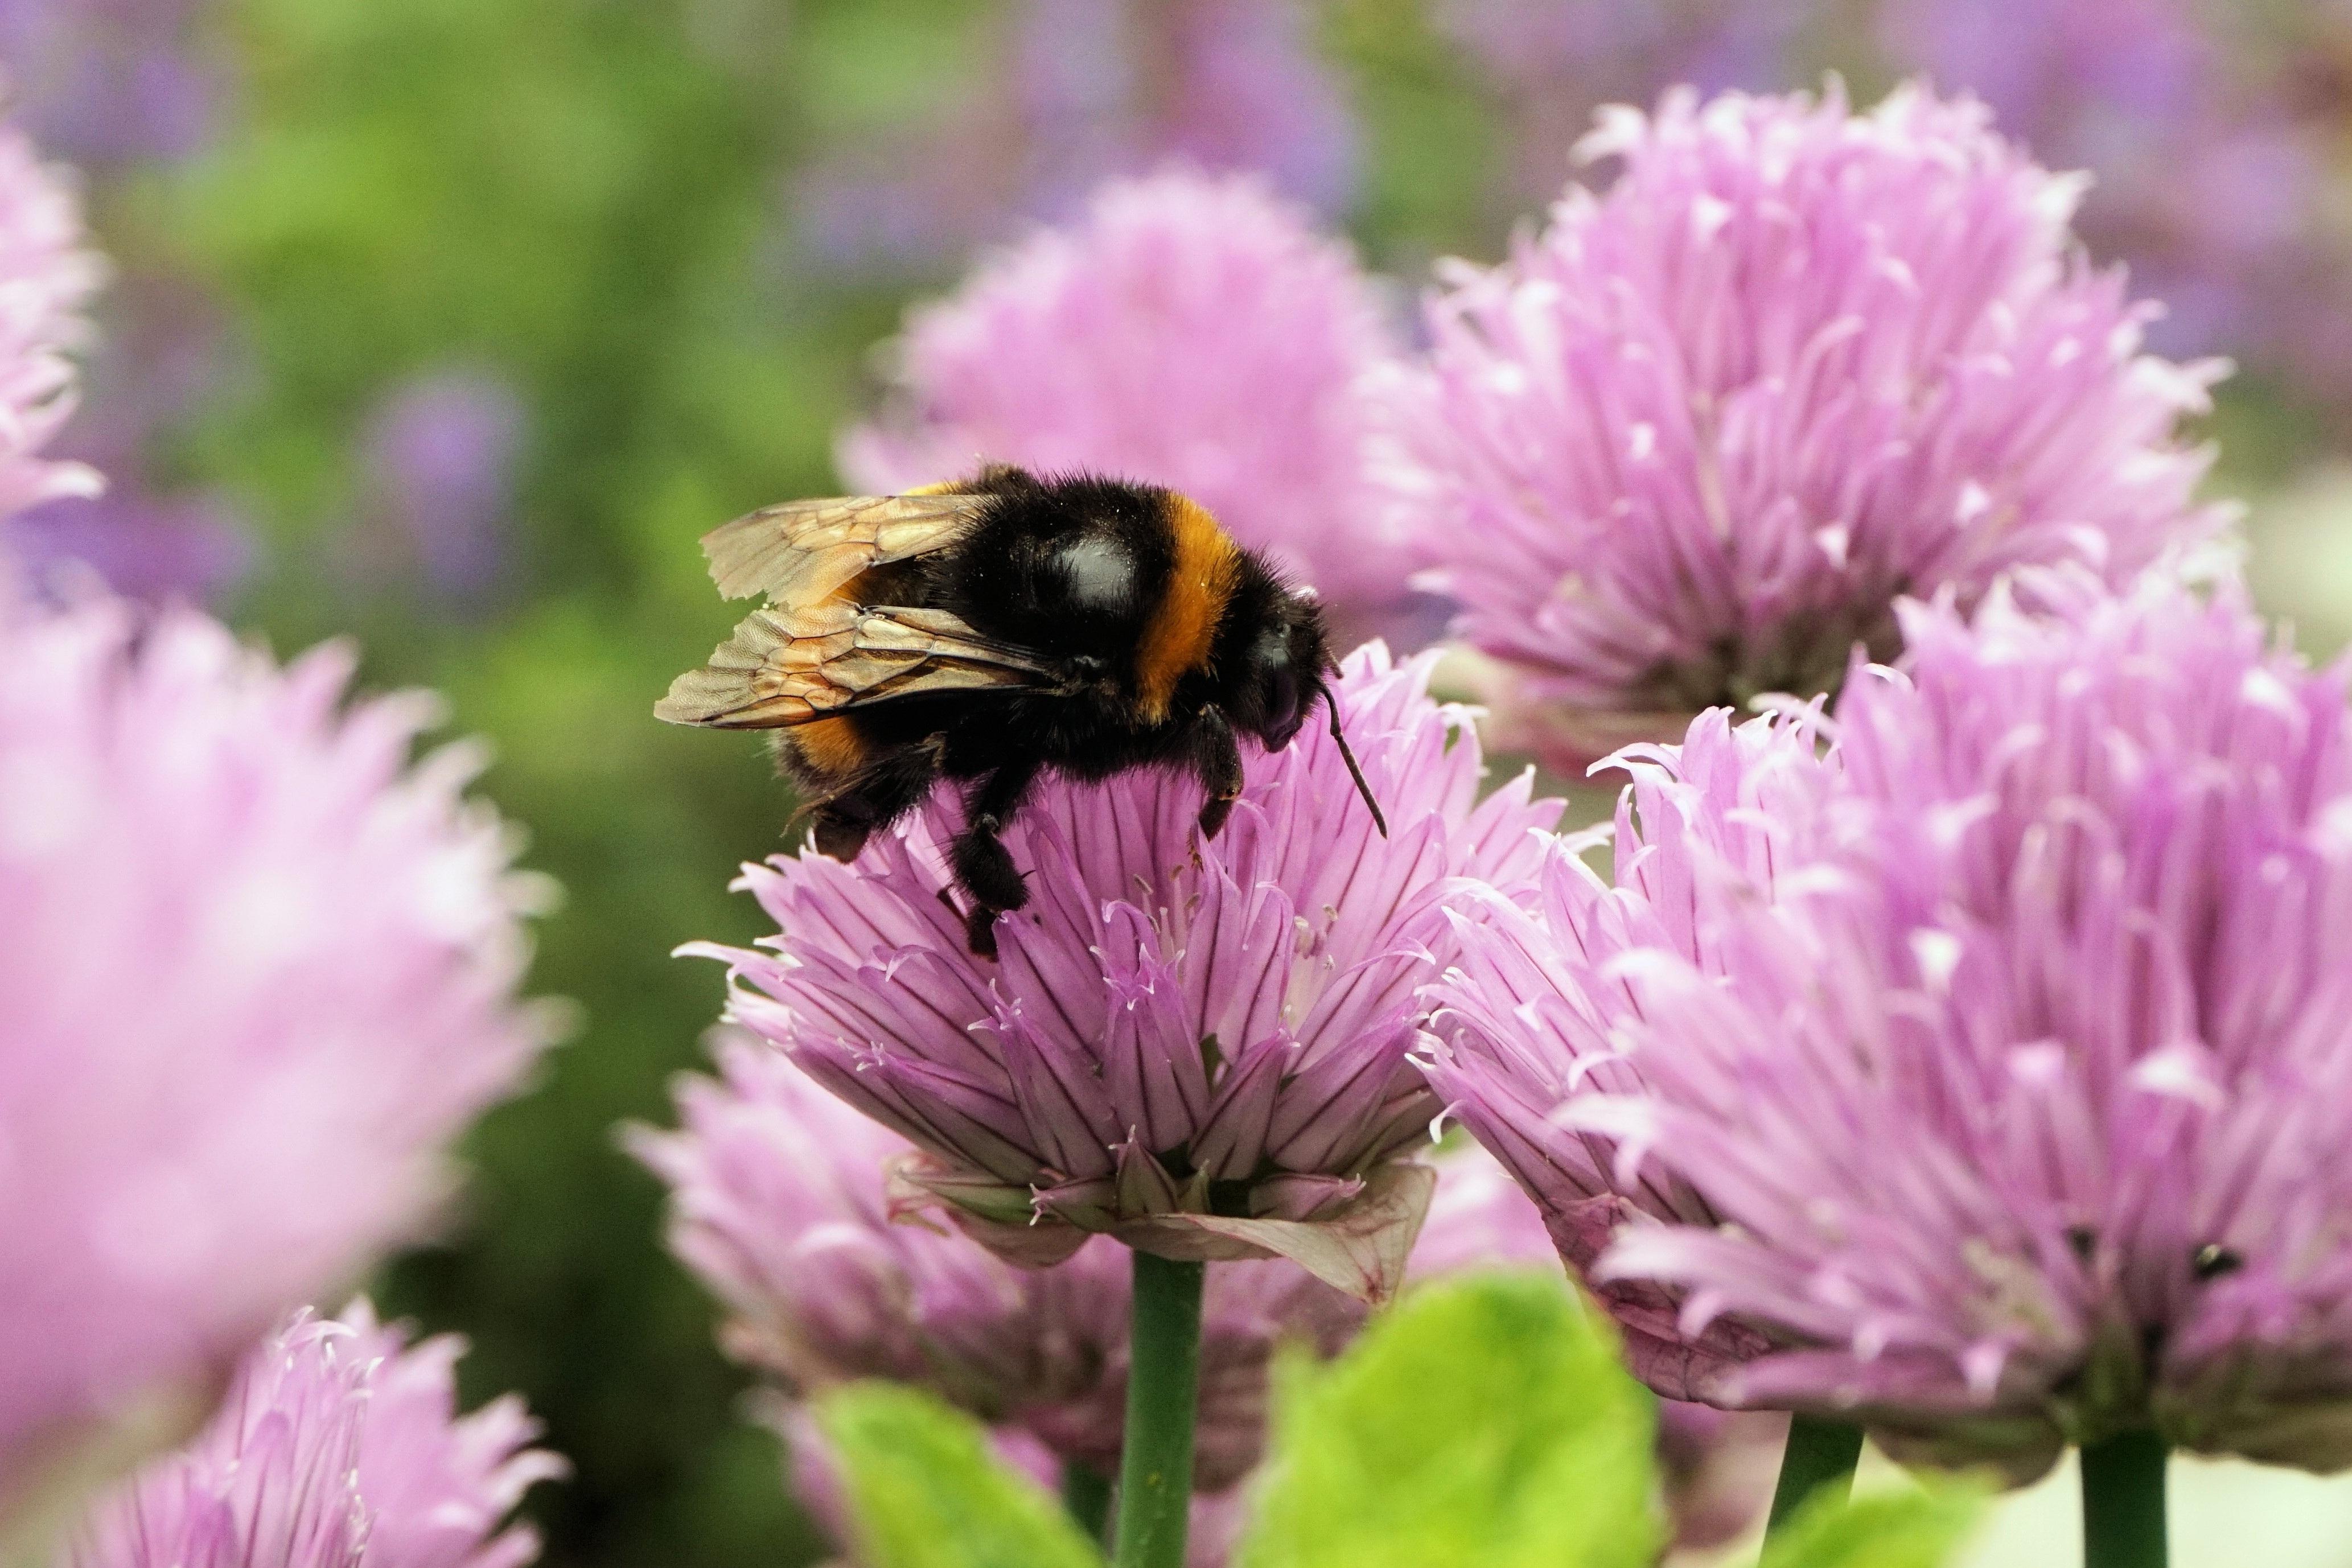 kostenlose foto natur bl hen fl gel blume lila bl tenblatt tier sommer pollen makro. Black Bedroom Furniture Sets. Home Design Ideas